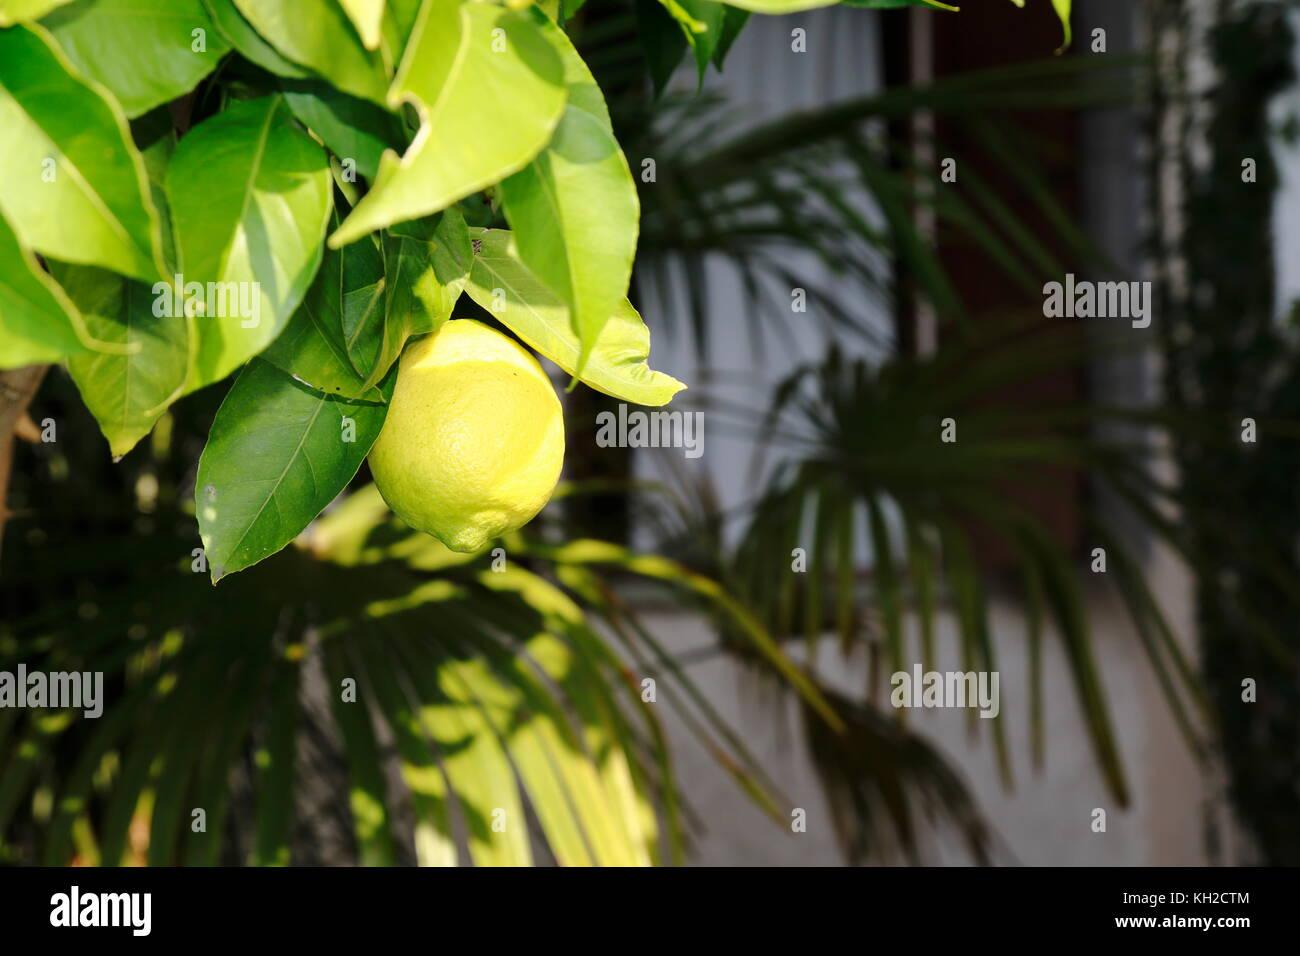 Zitrone, Limone, Limette, am Baum Stock Photo